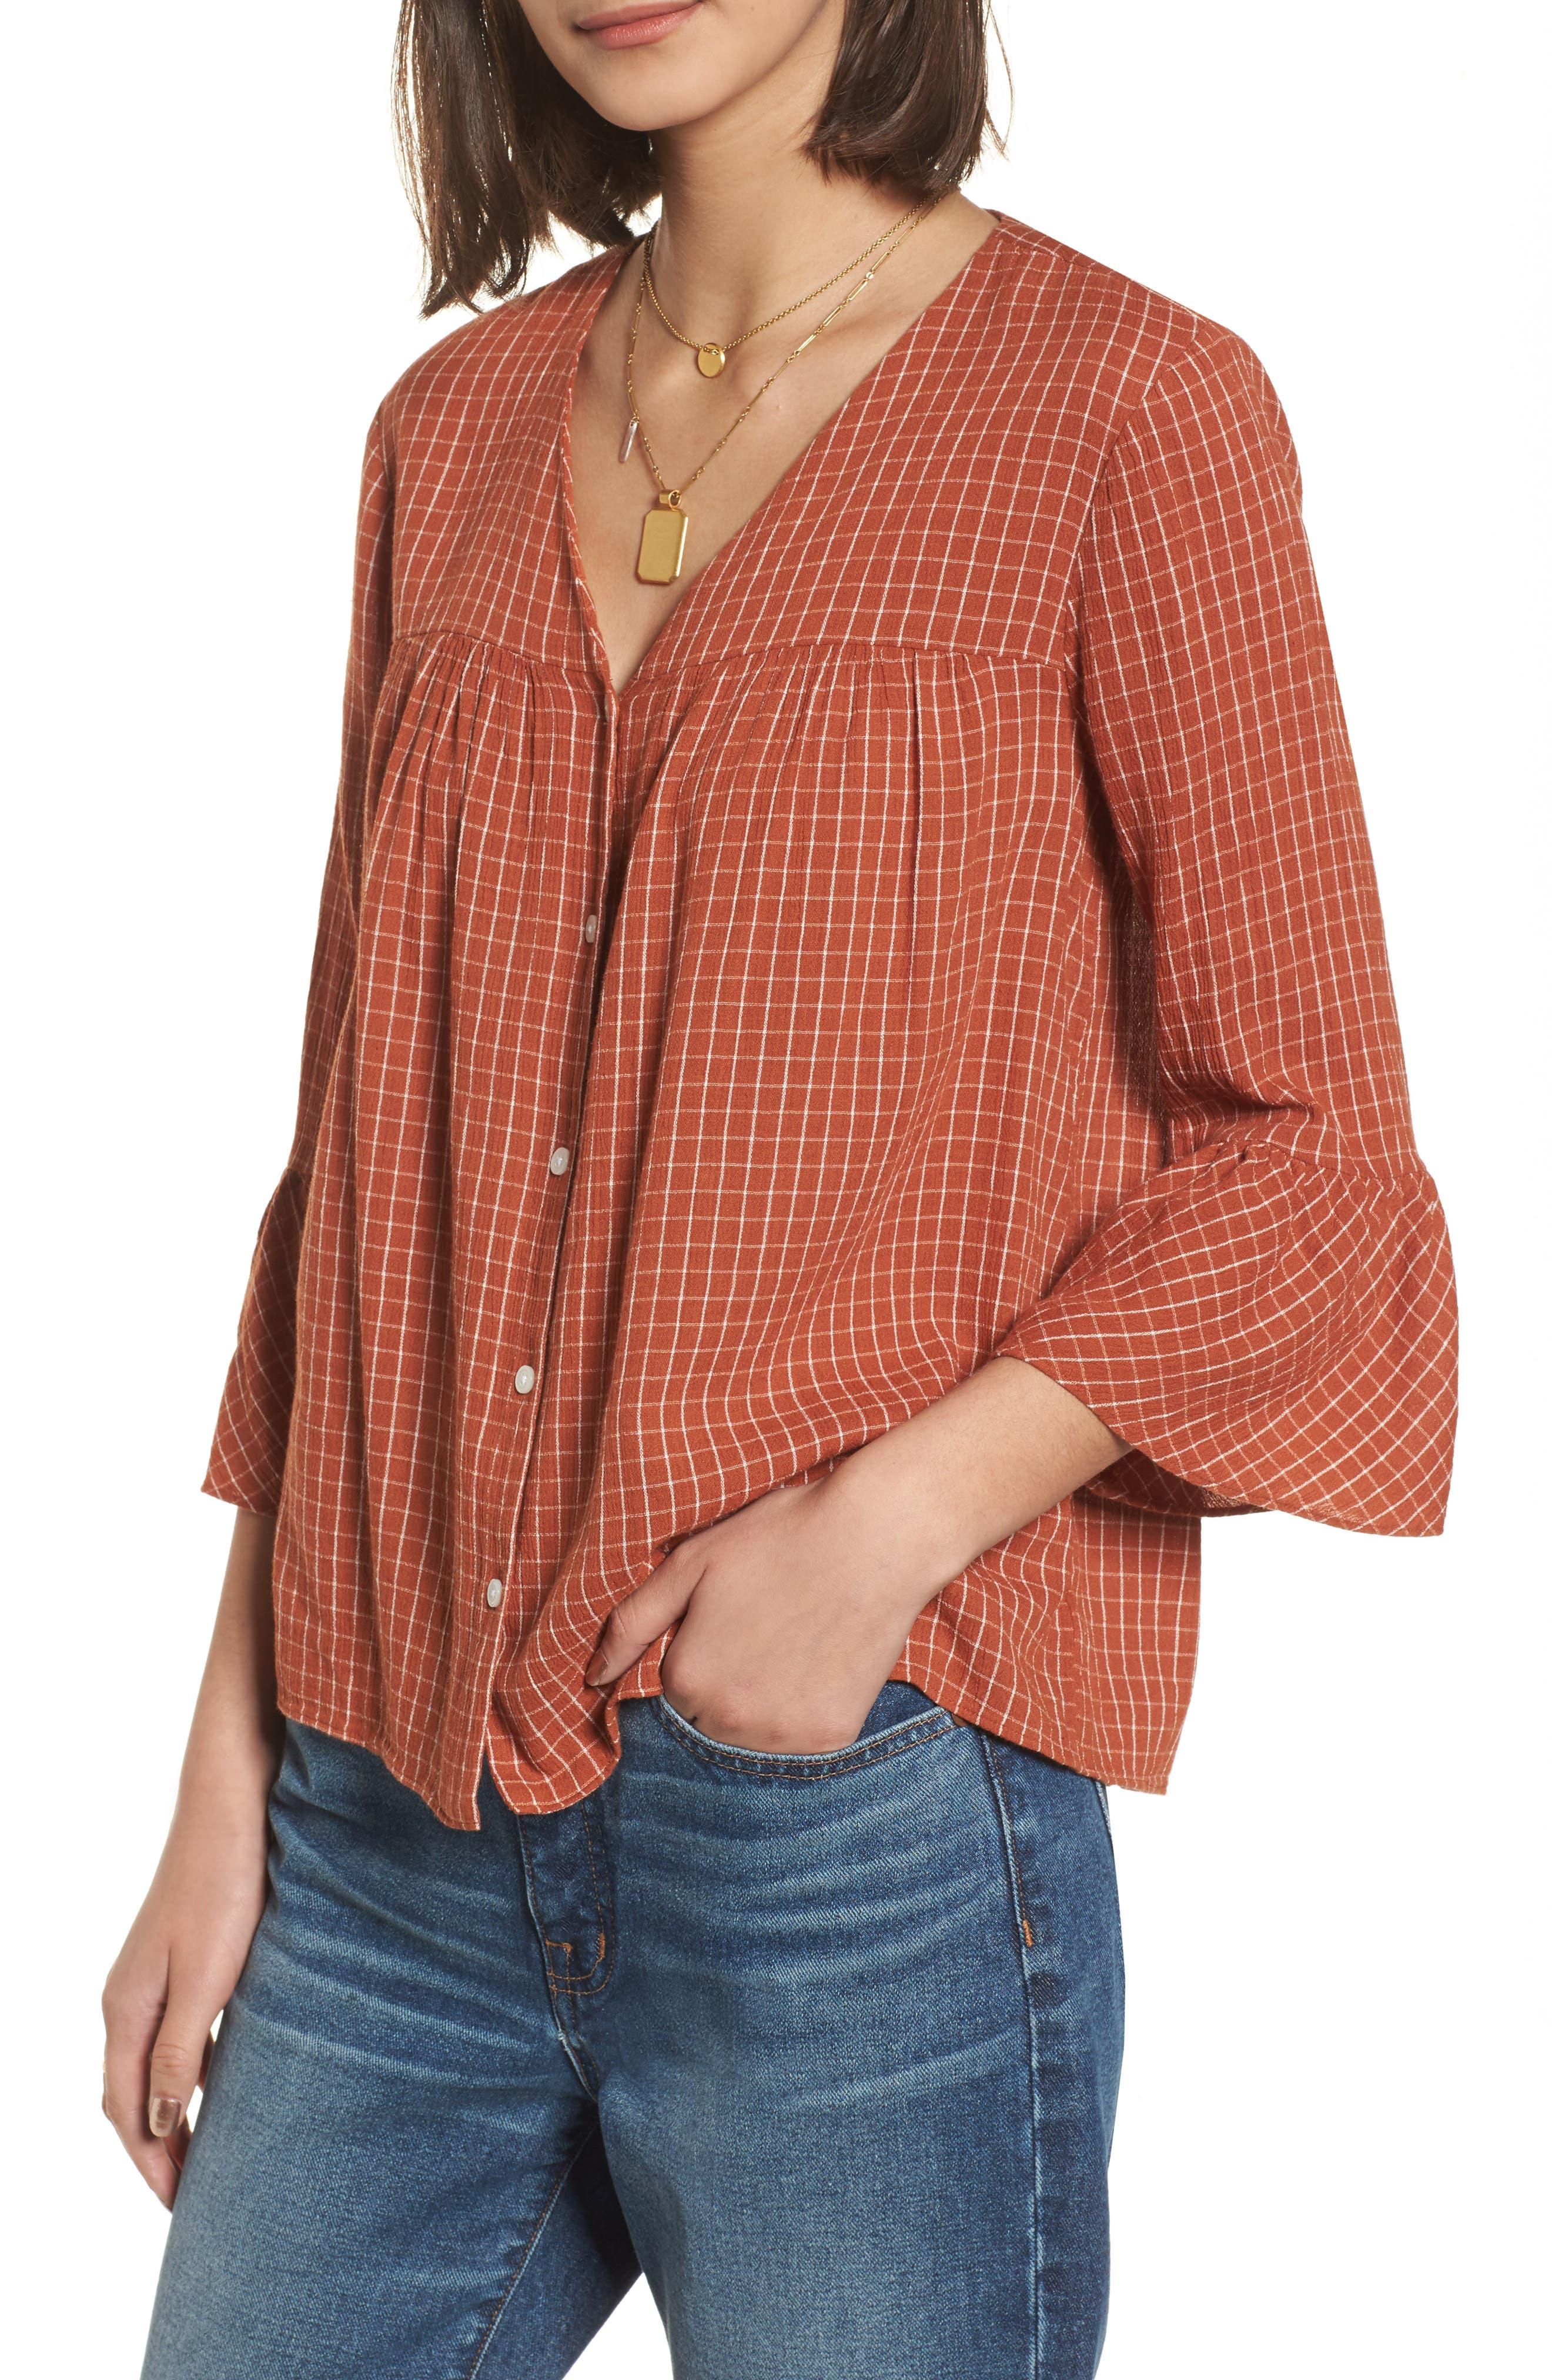 Veranda Bell Sleeve Shirt,                             Main thumbnail 1, color,                             800